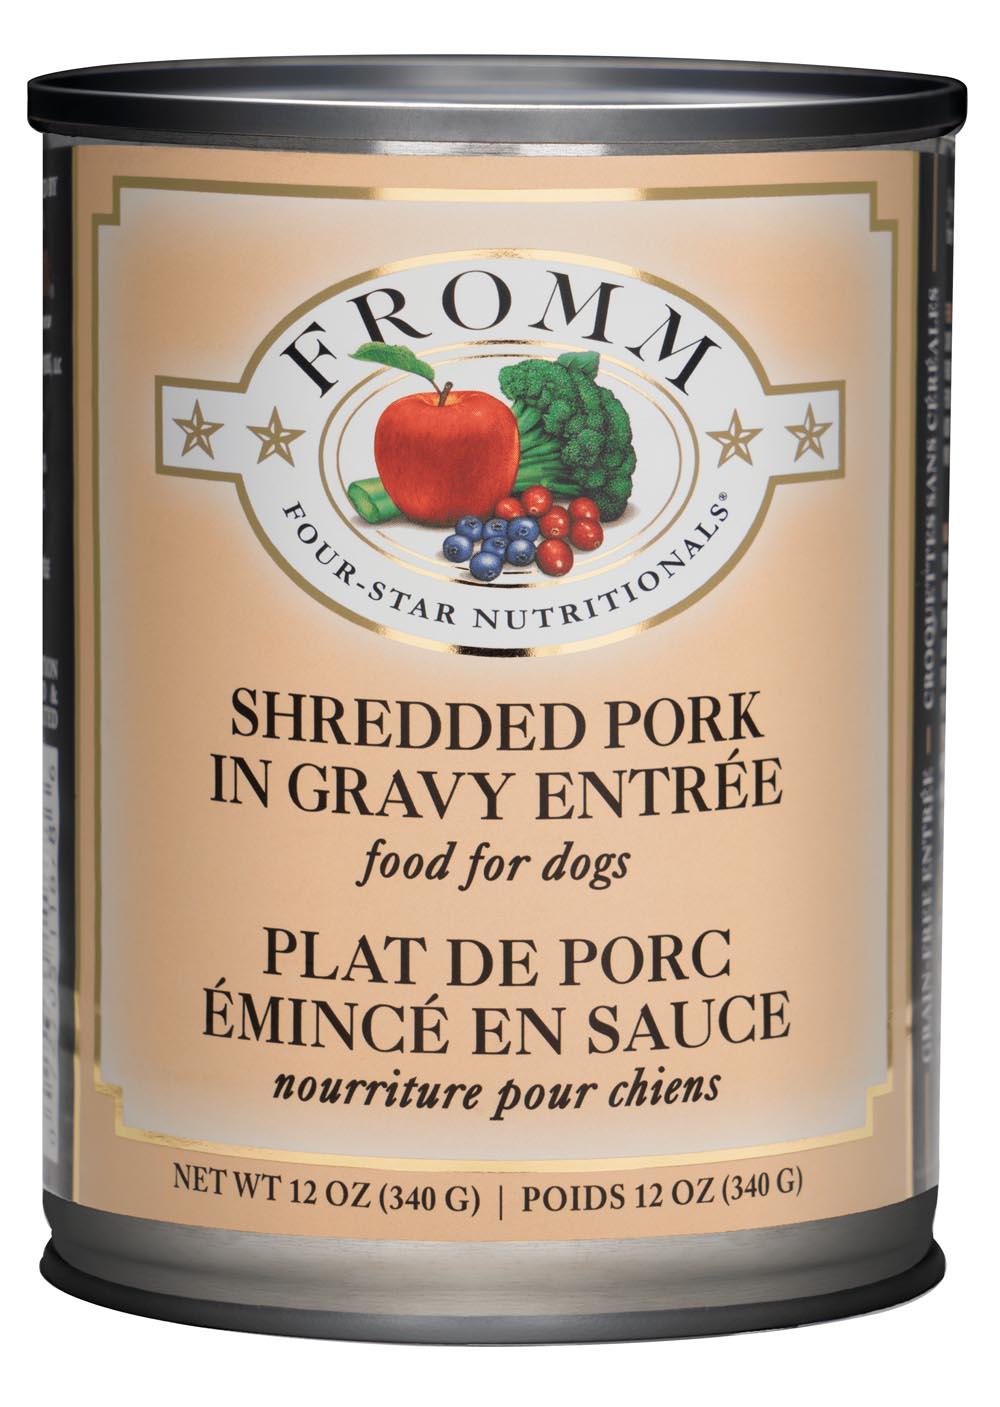 Fromm Four Star Grain Free Shredded Pork in Gravy Entree Canned Dog Food, 12-oz